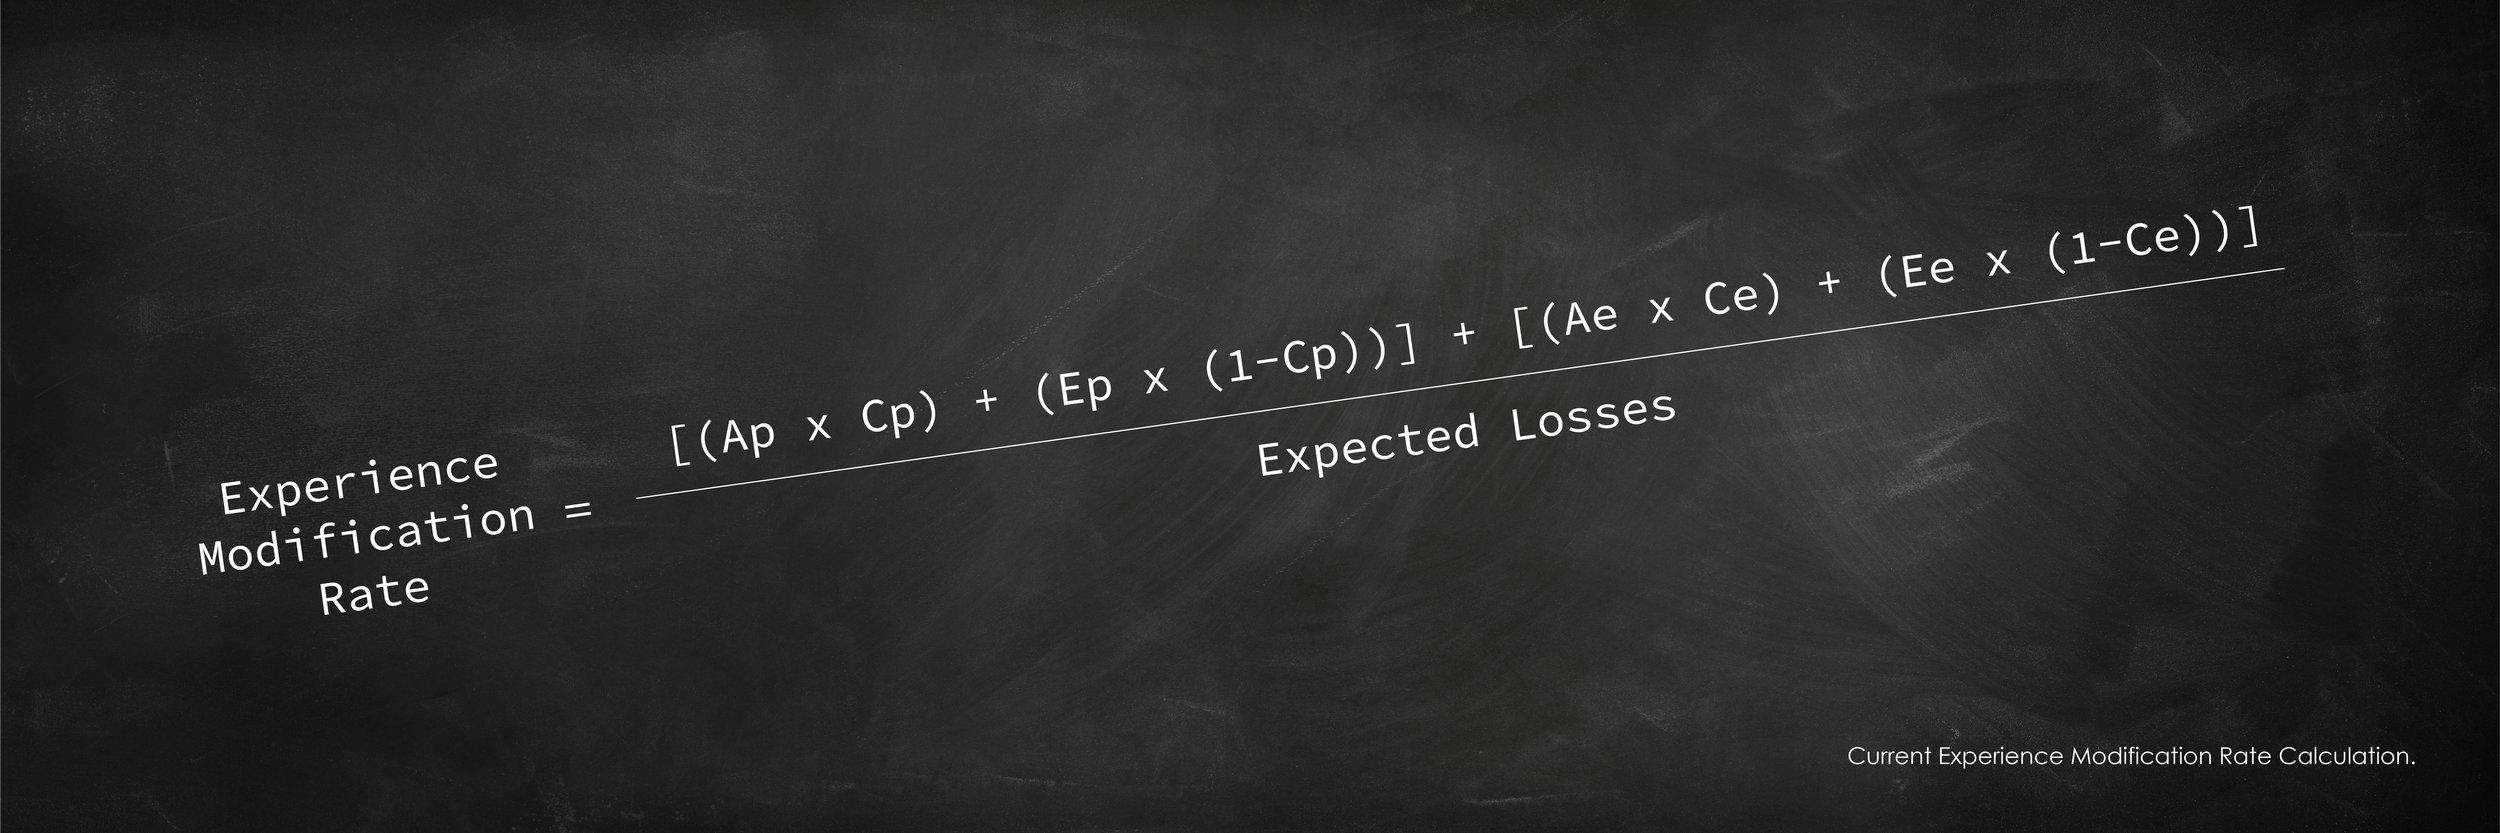 Ex Mod current calculation